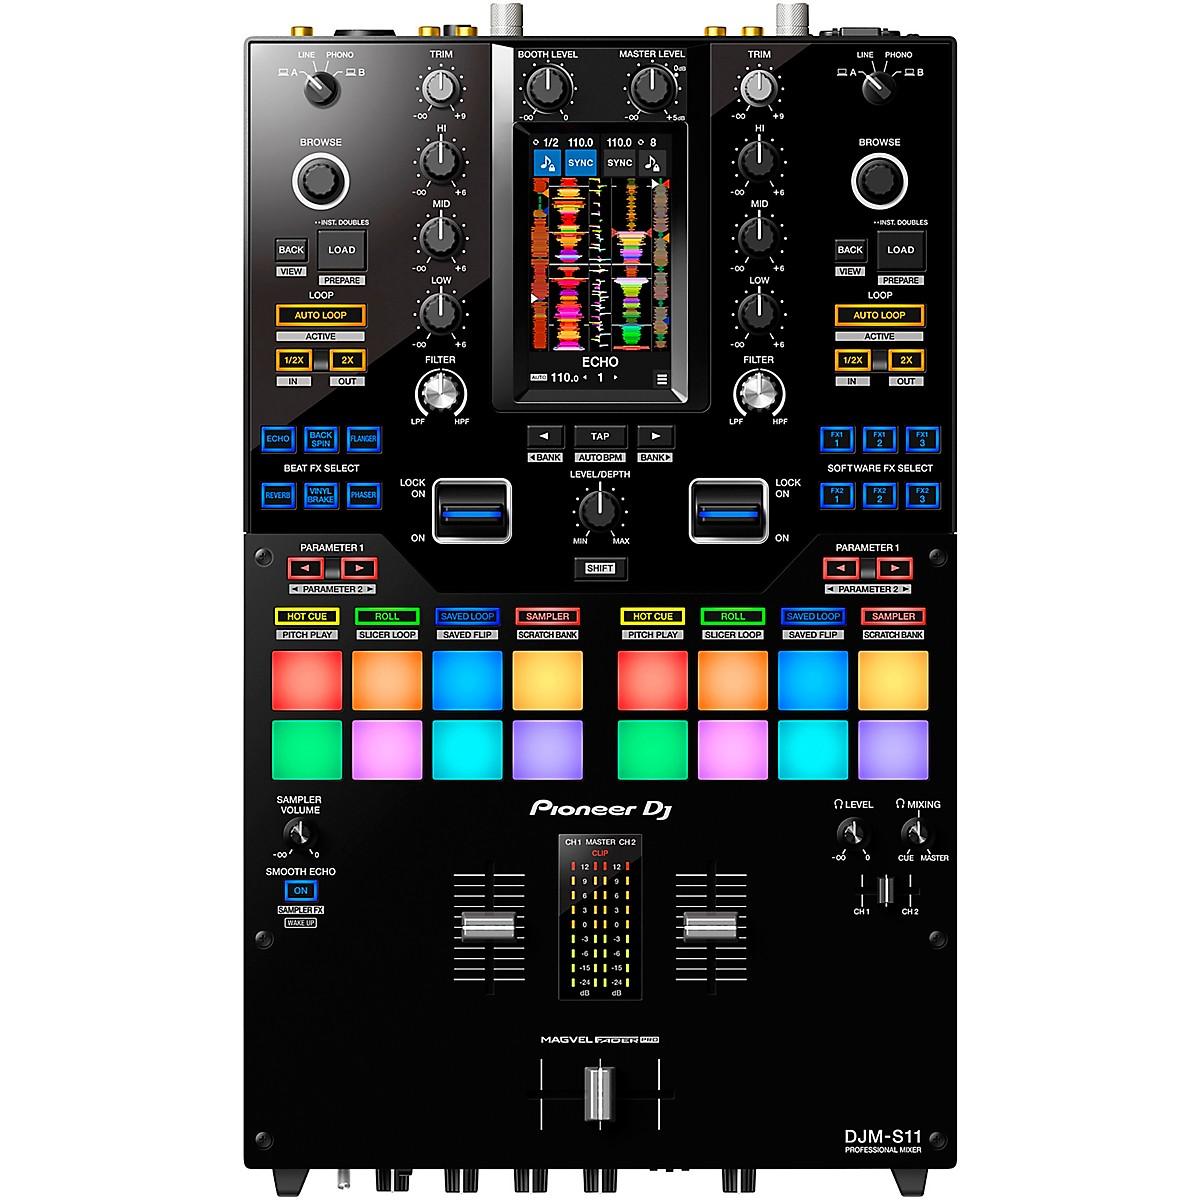 Pioneer DJM-S11 2-Channel Battle Mixer for Serato DJ & rekordbox With Performance Pads